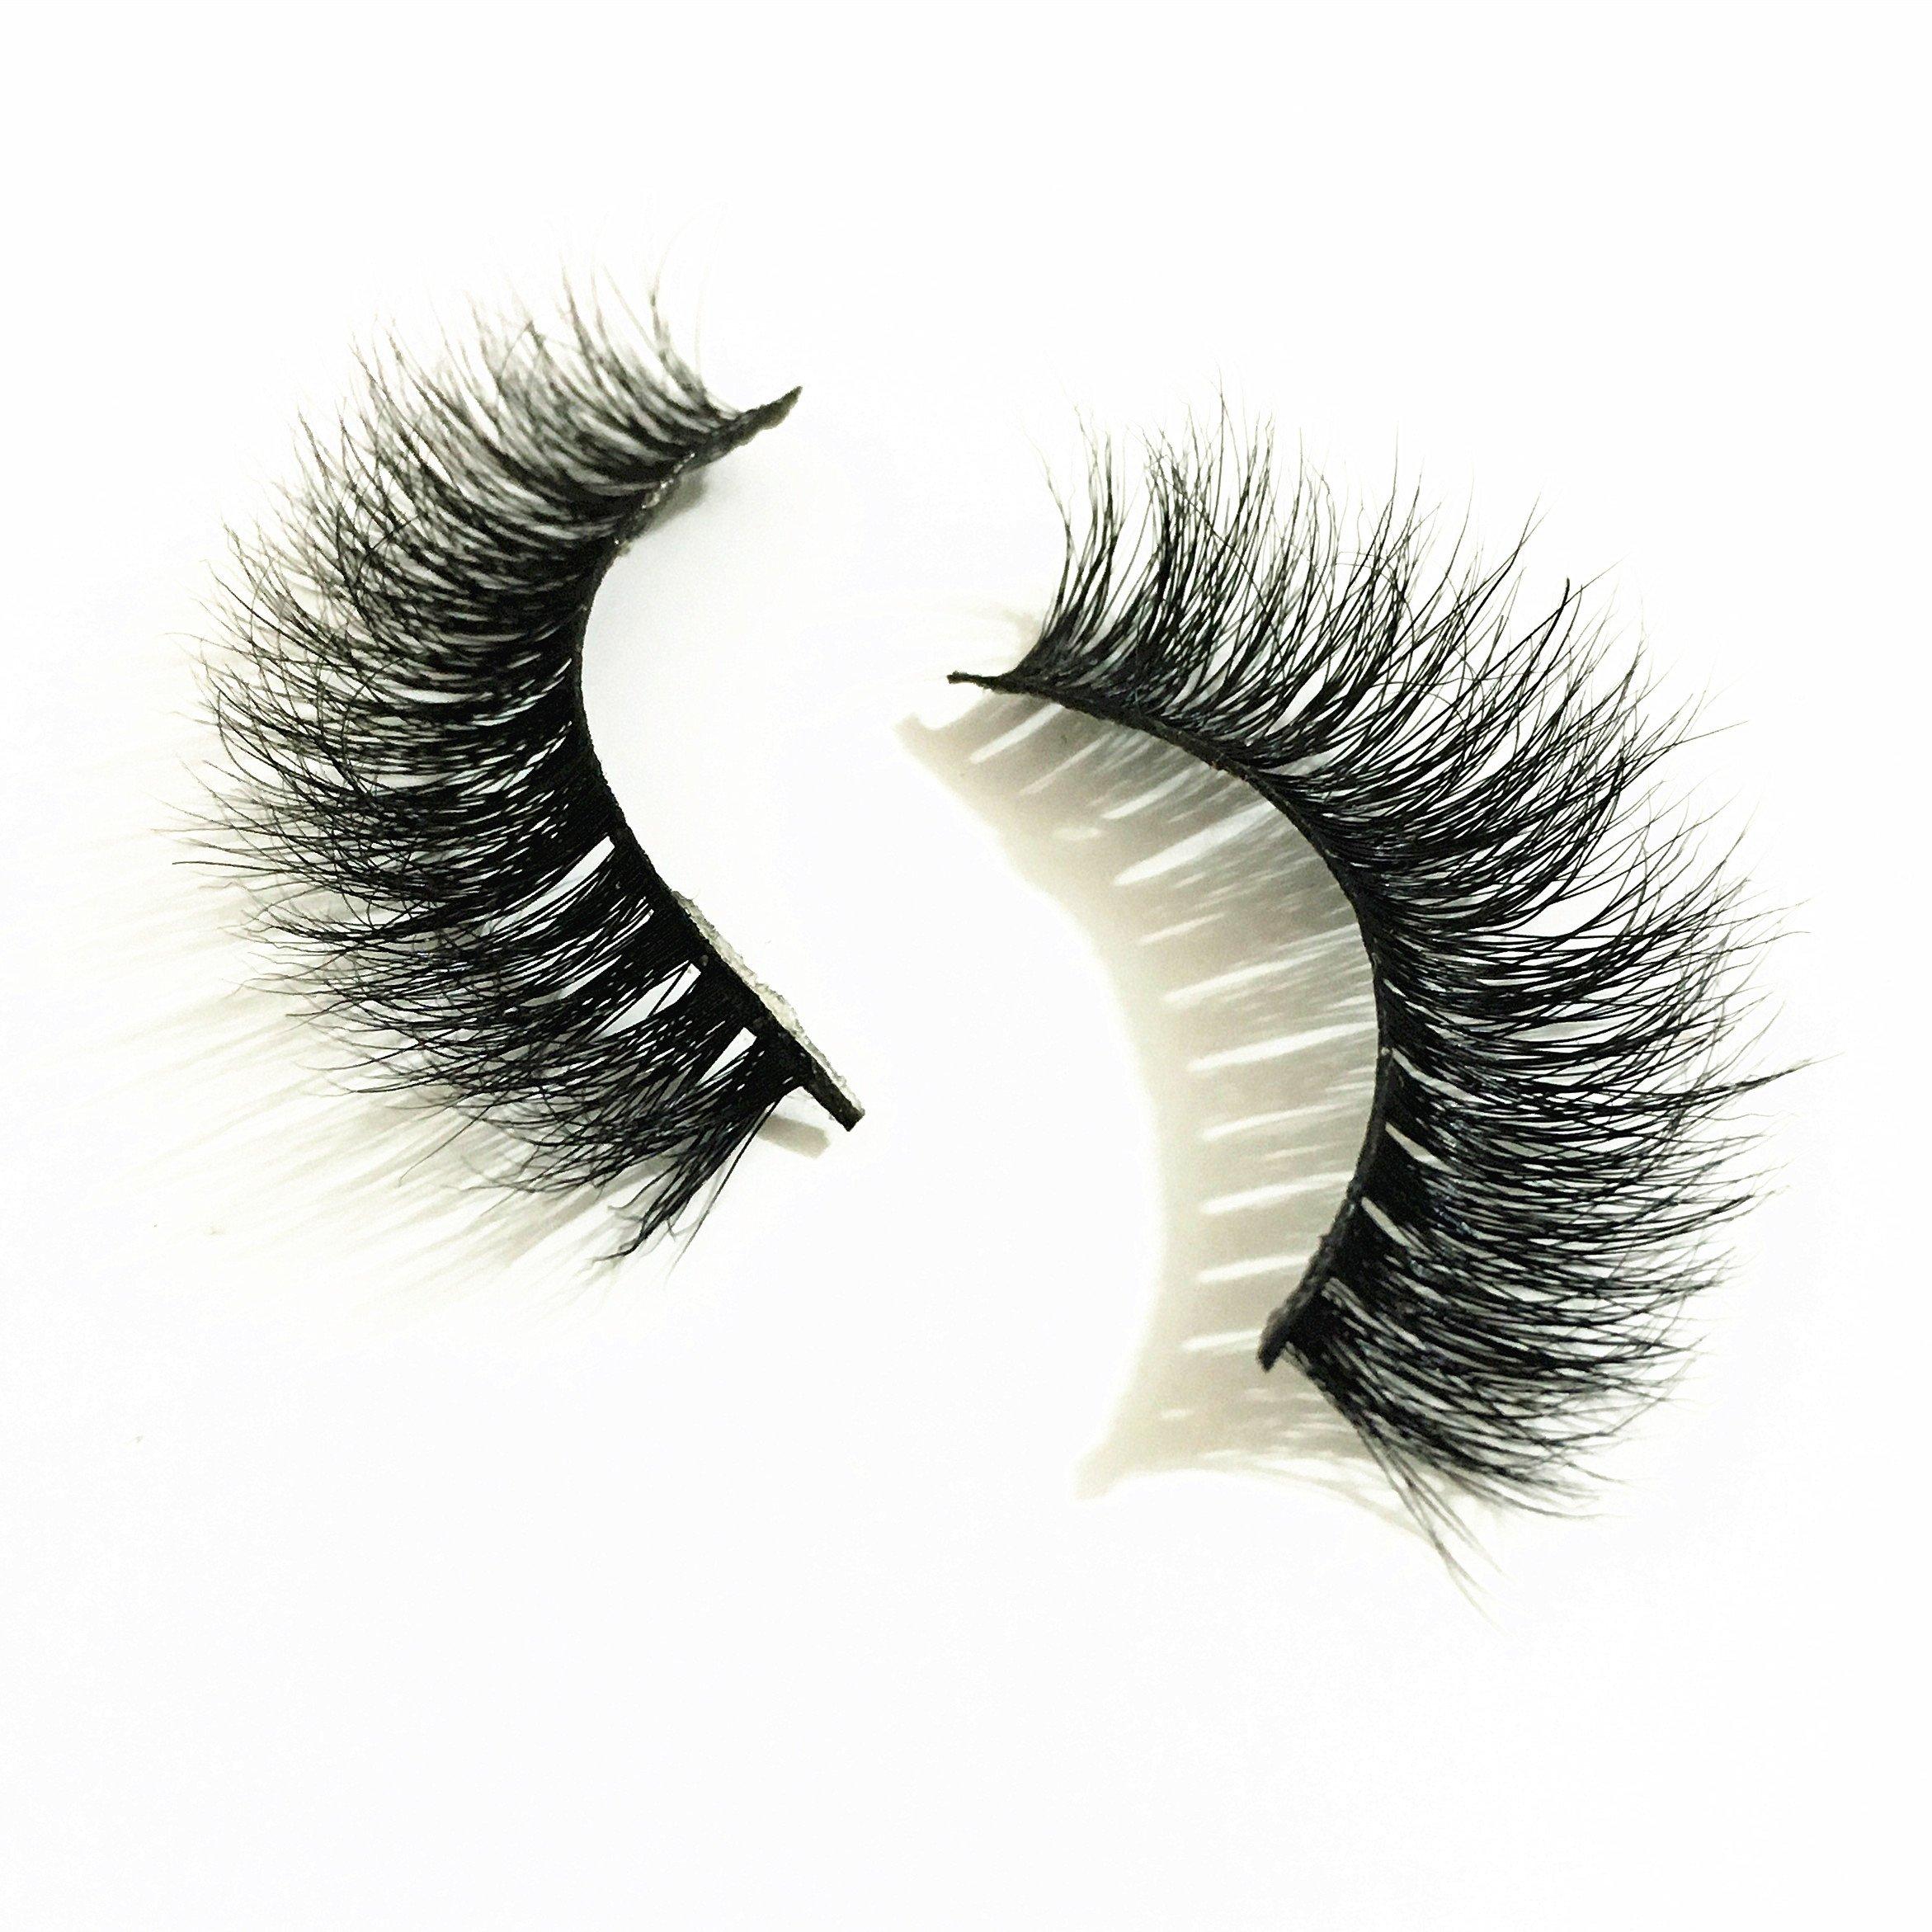 873ab21390a Get Quotations · 3D02 Mink lashes Hand-made False Lashes Stirp Reusable 100%  Siberian Fur Fake Eyelash